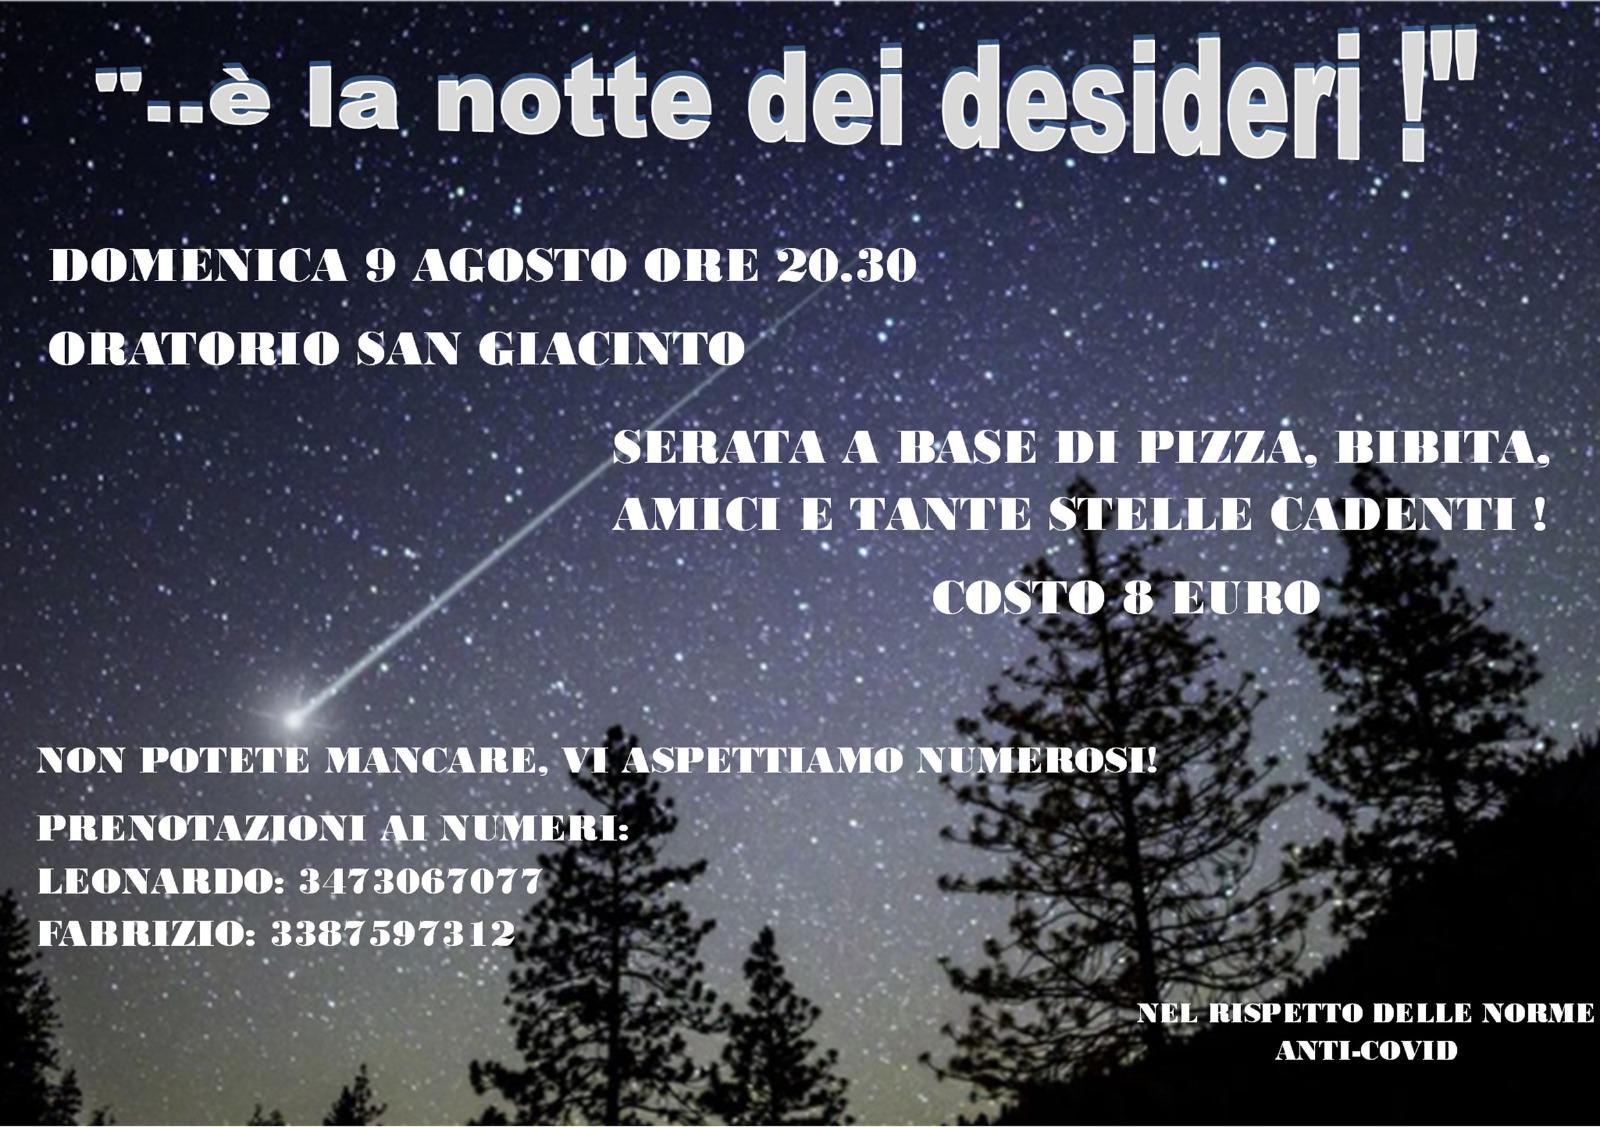 LA NOTTE DEI DESIDERI @ Oratorio di San Giacinto